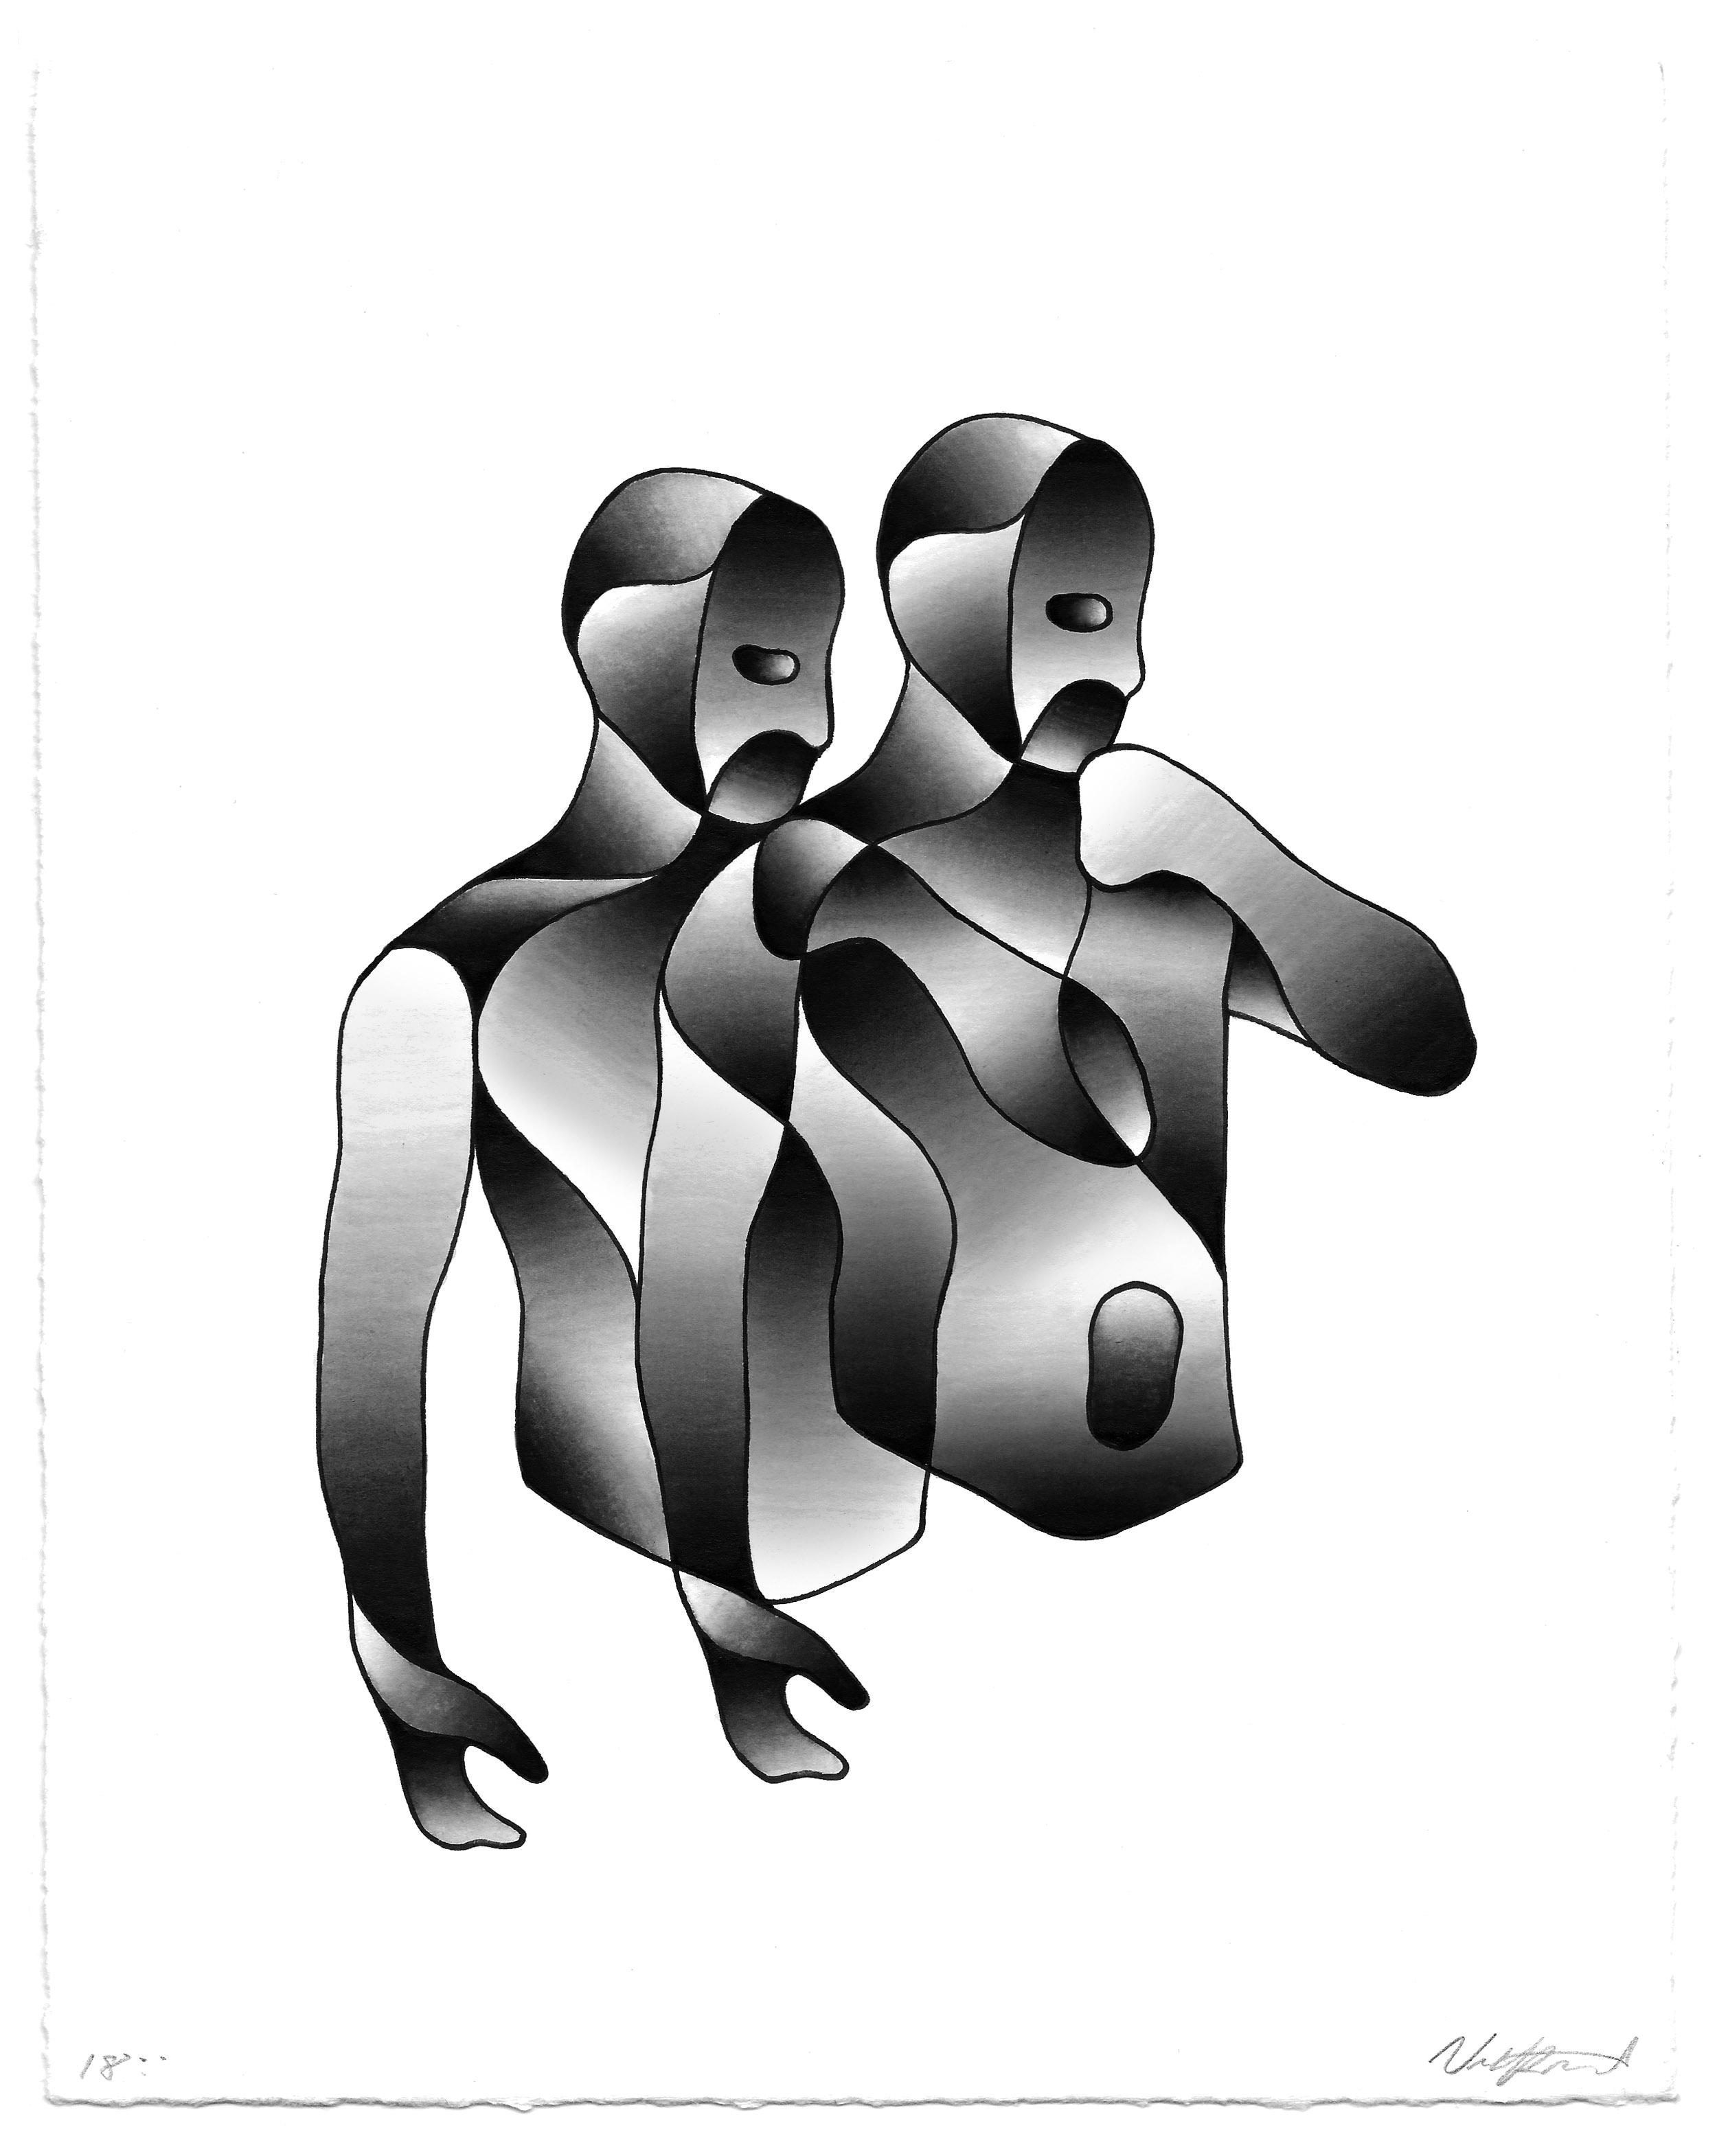 Figure_48.jpg